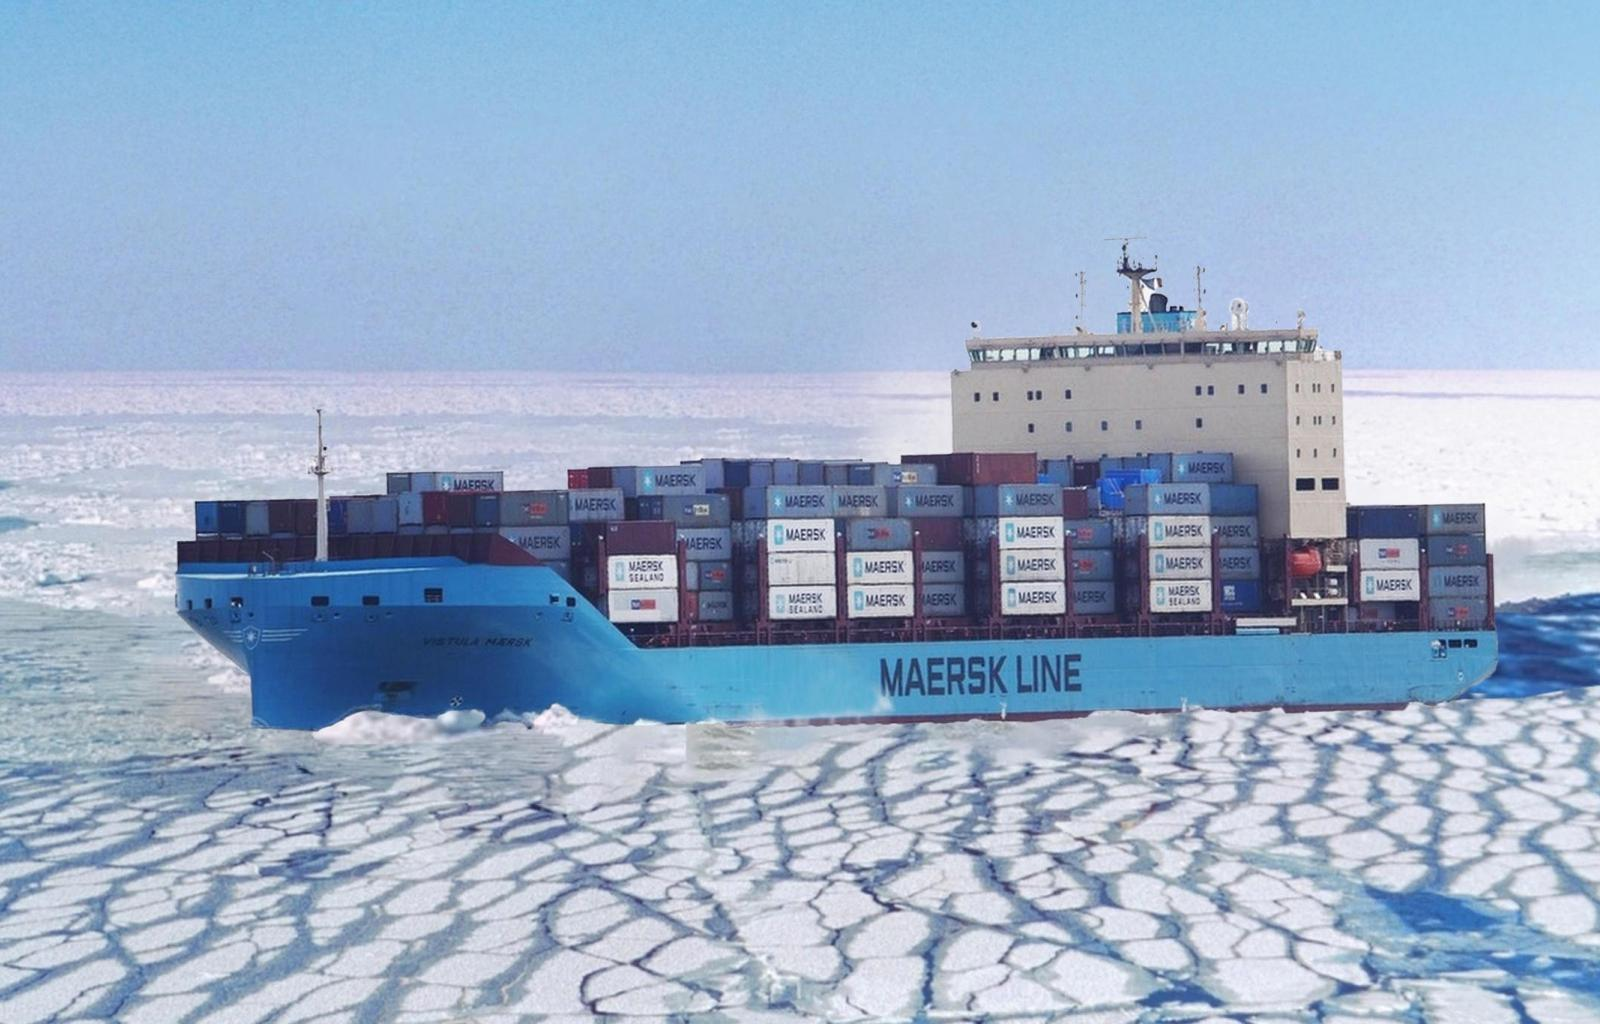 Maersk unveils its plans on decarbonization